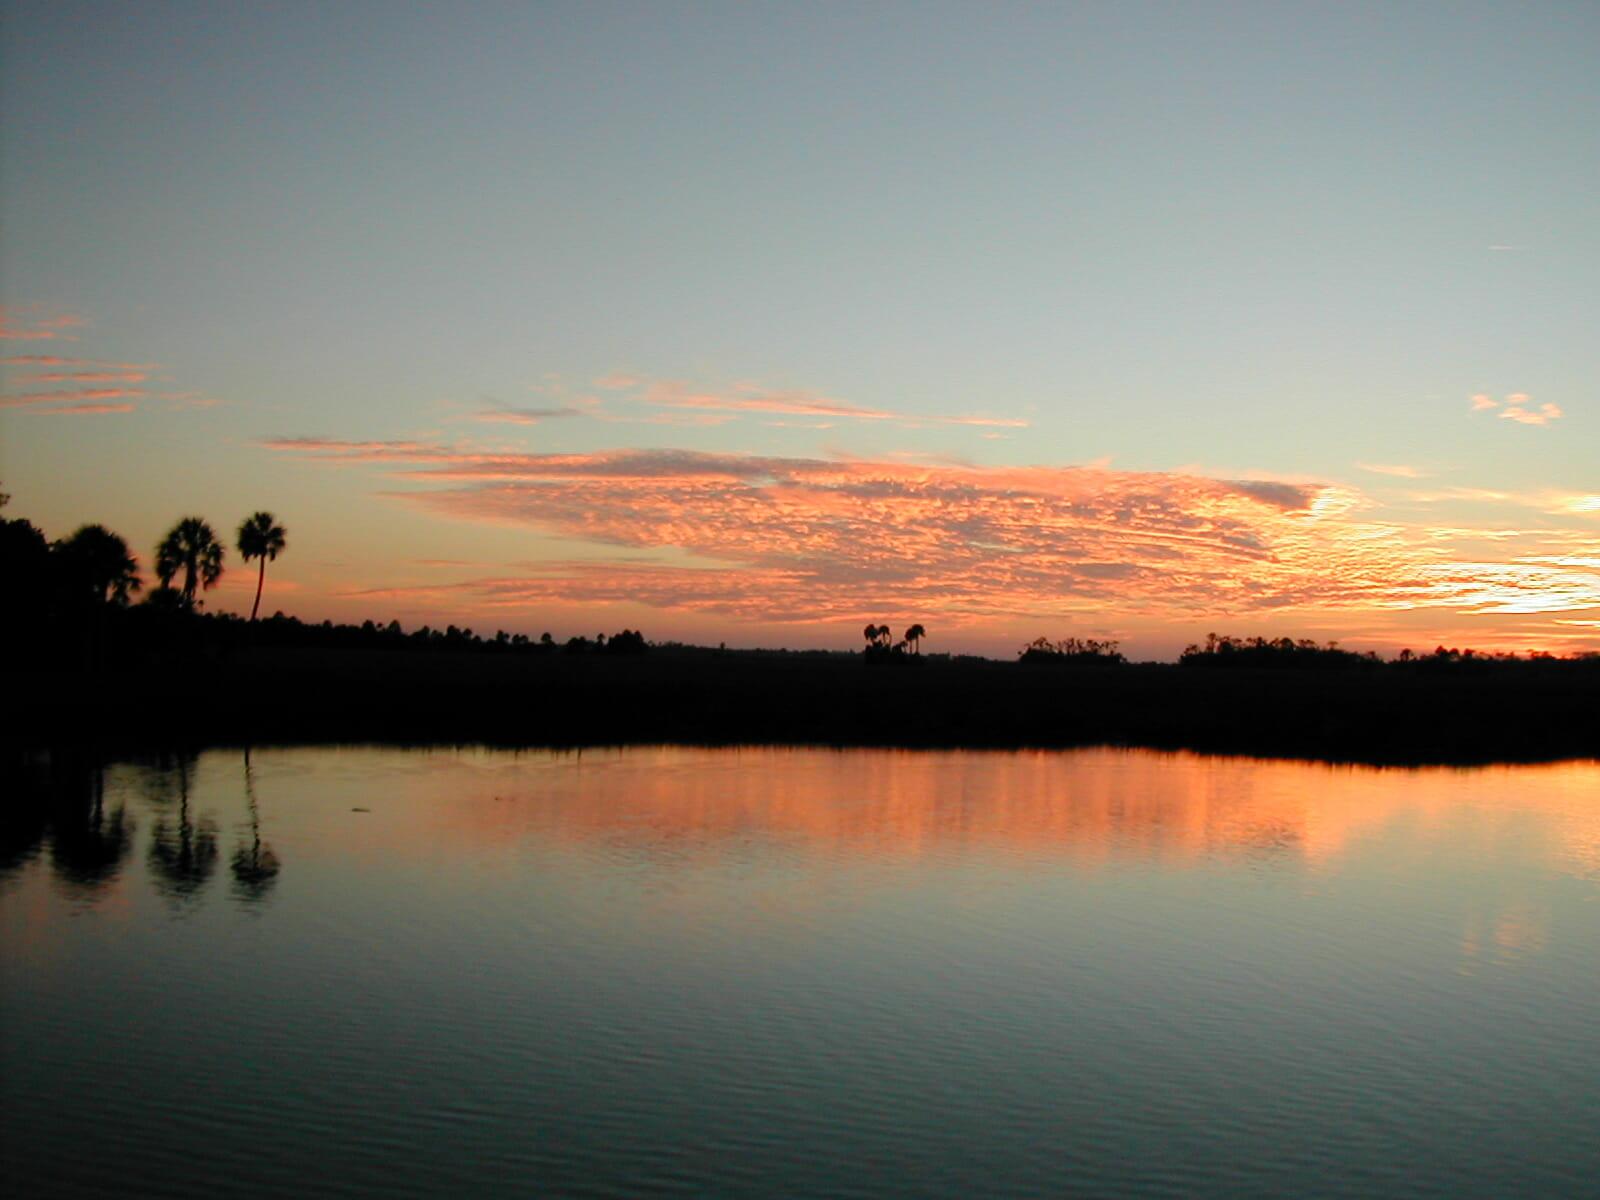 Sunset at Hernando Beach